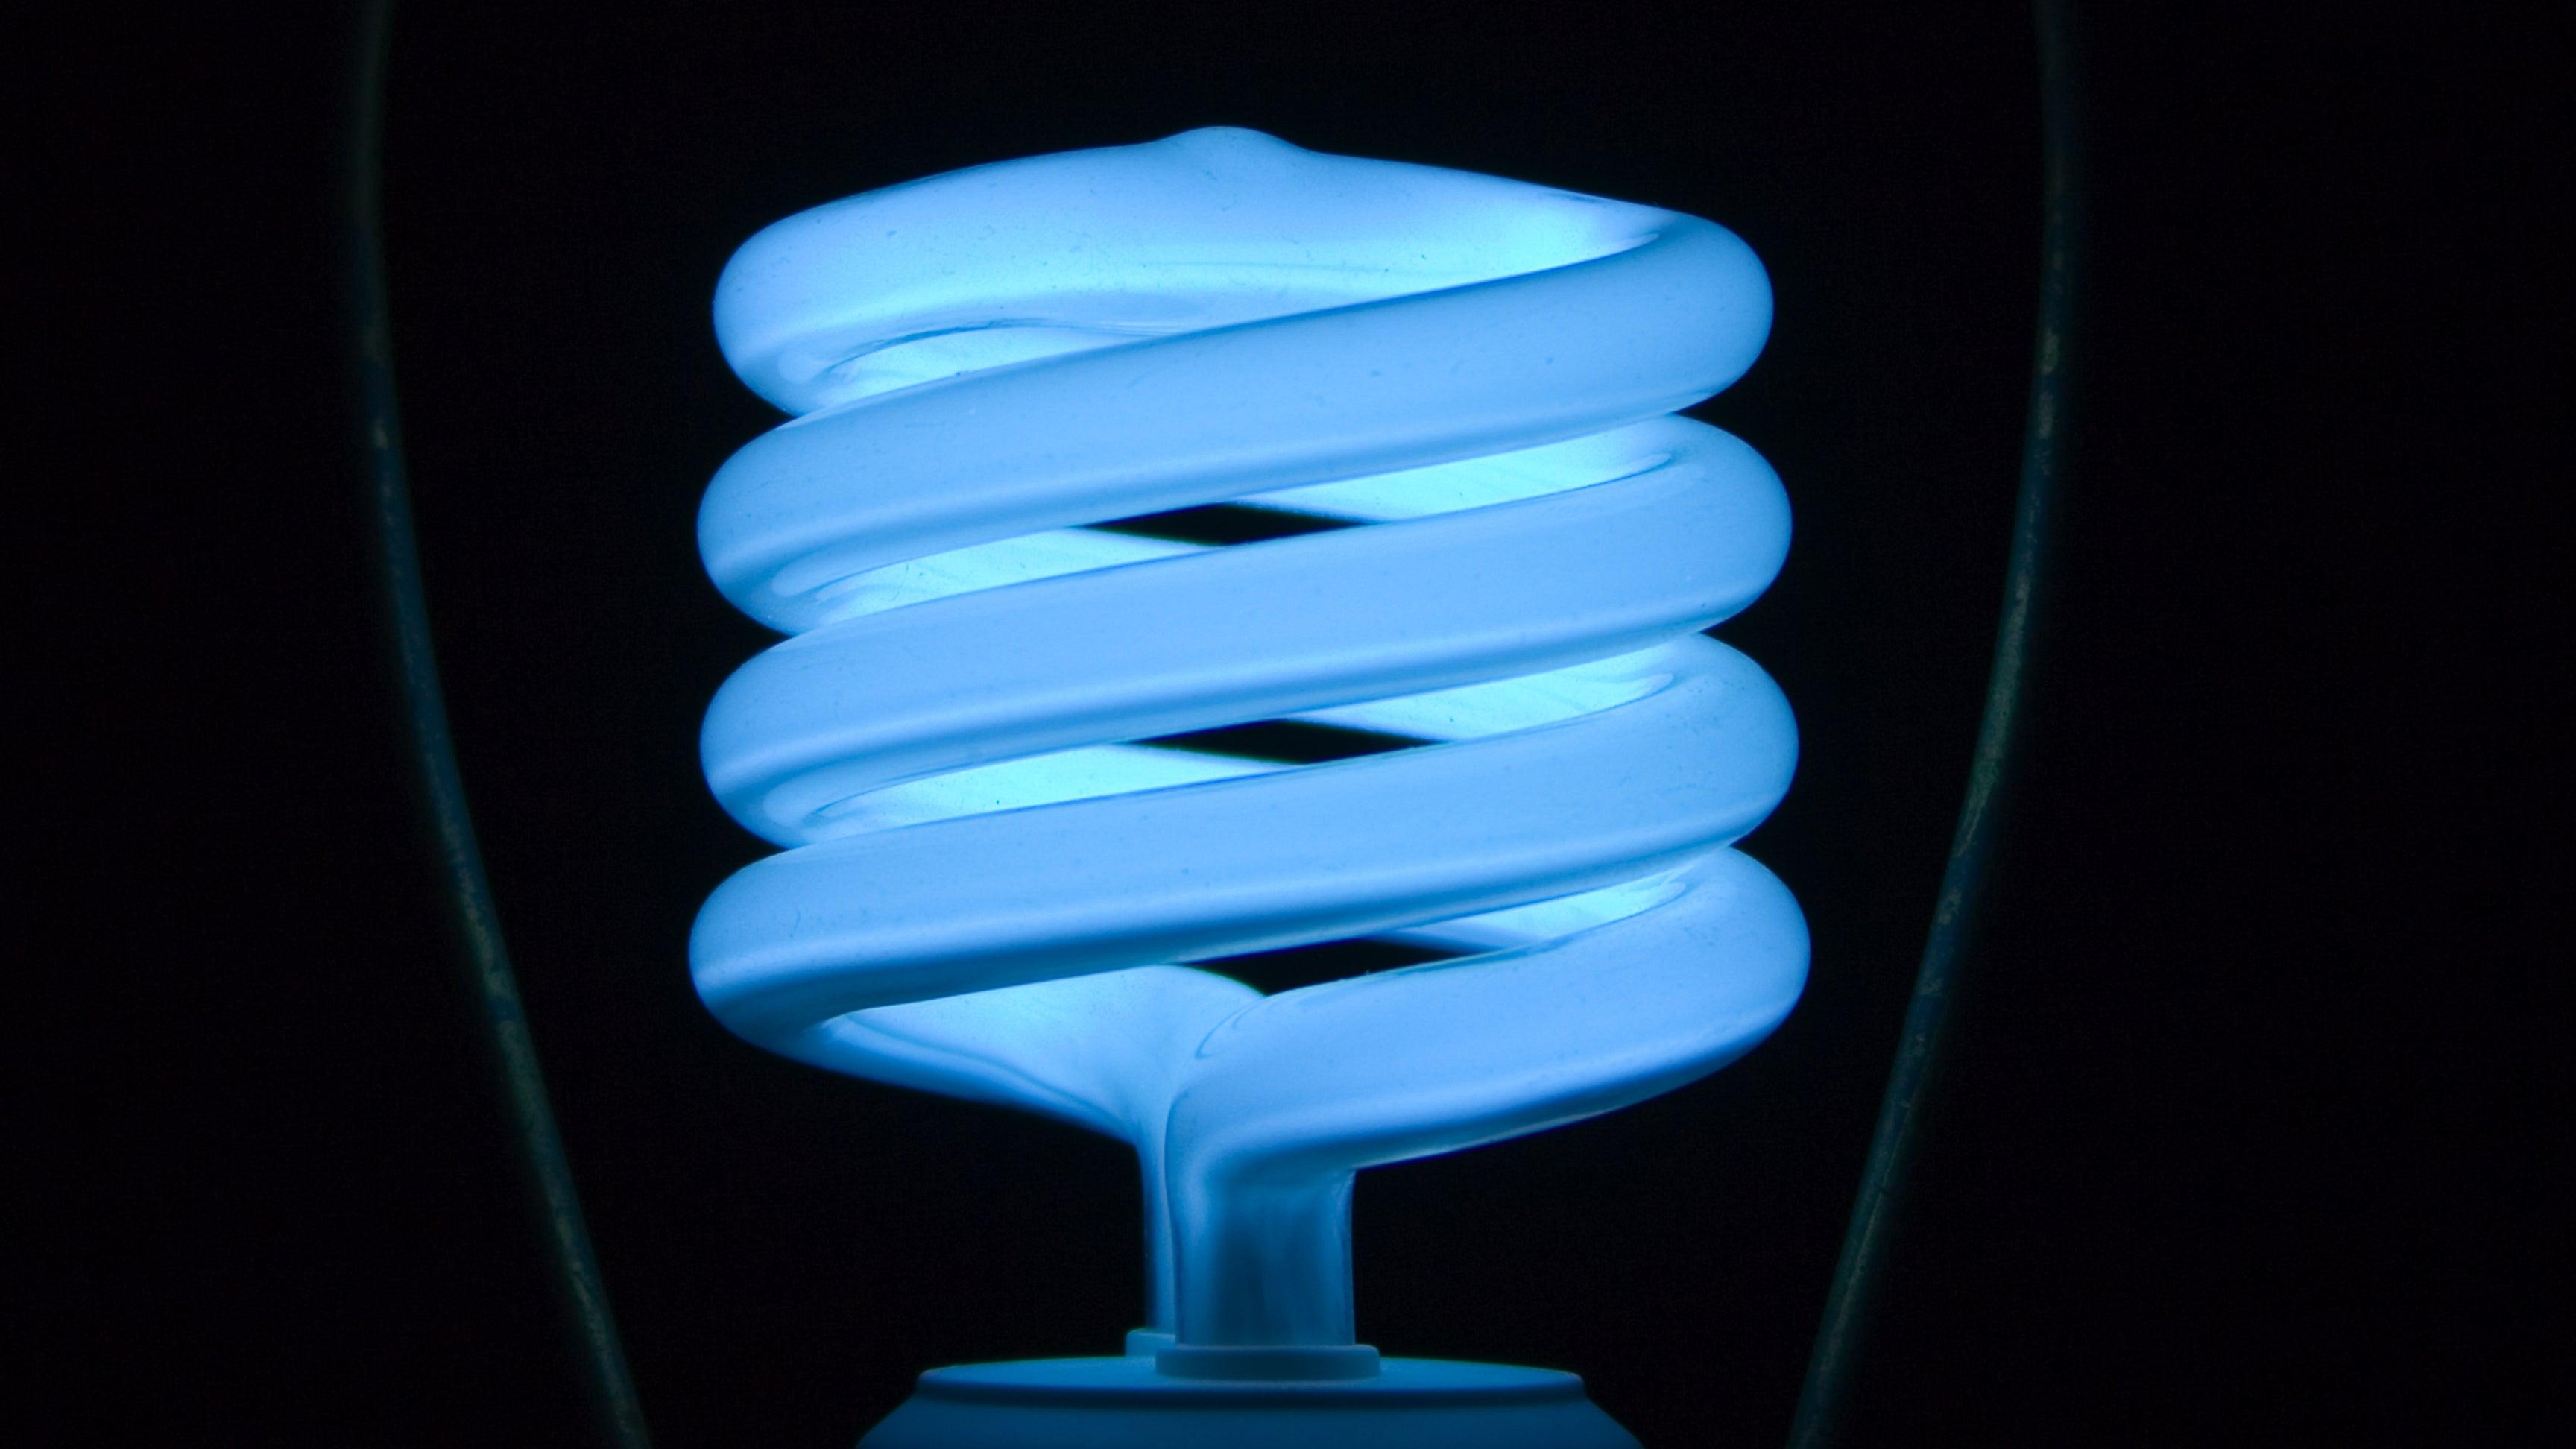 cfl general-electric leds lightbulbs smart-home